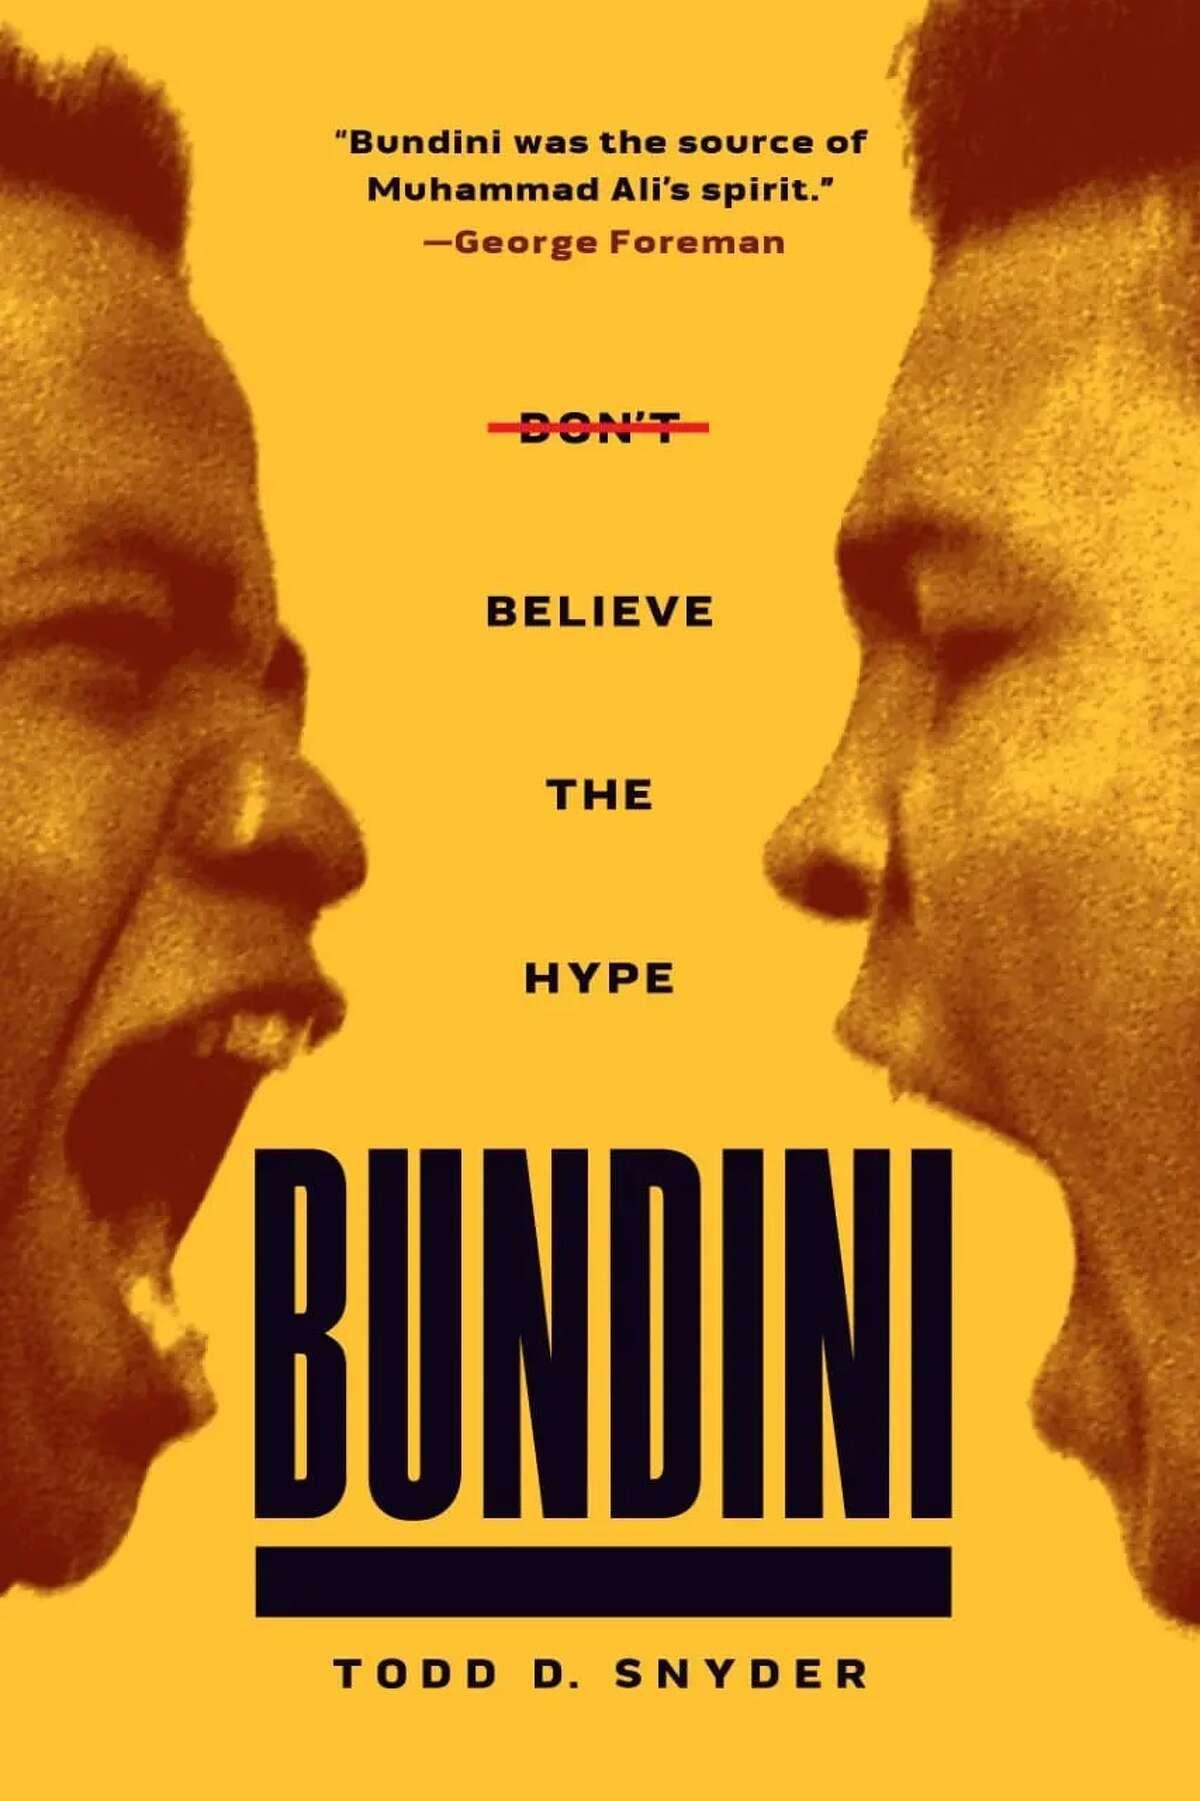 Todd D. Snyder's book cover on Drew Bundini Brown.